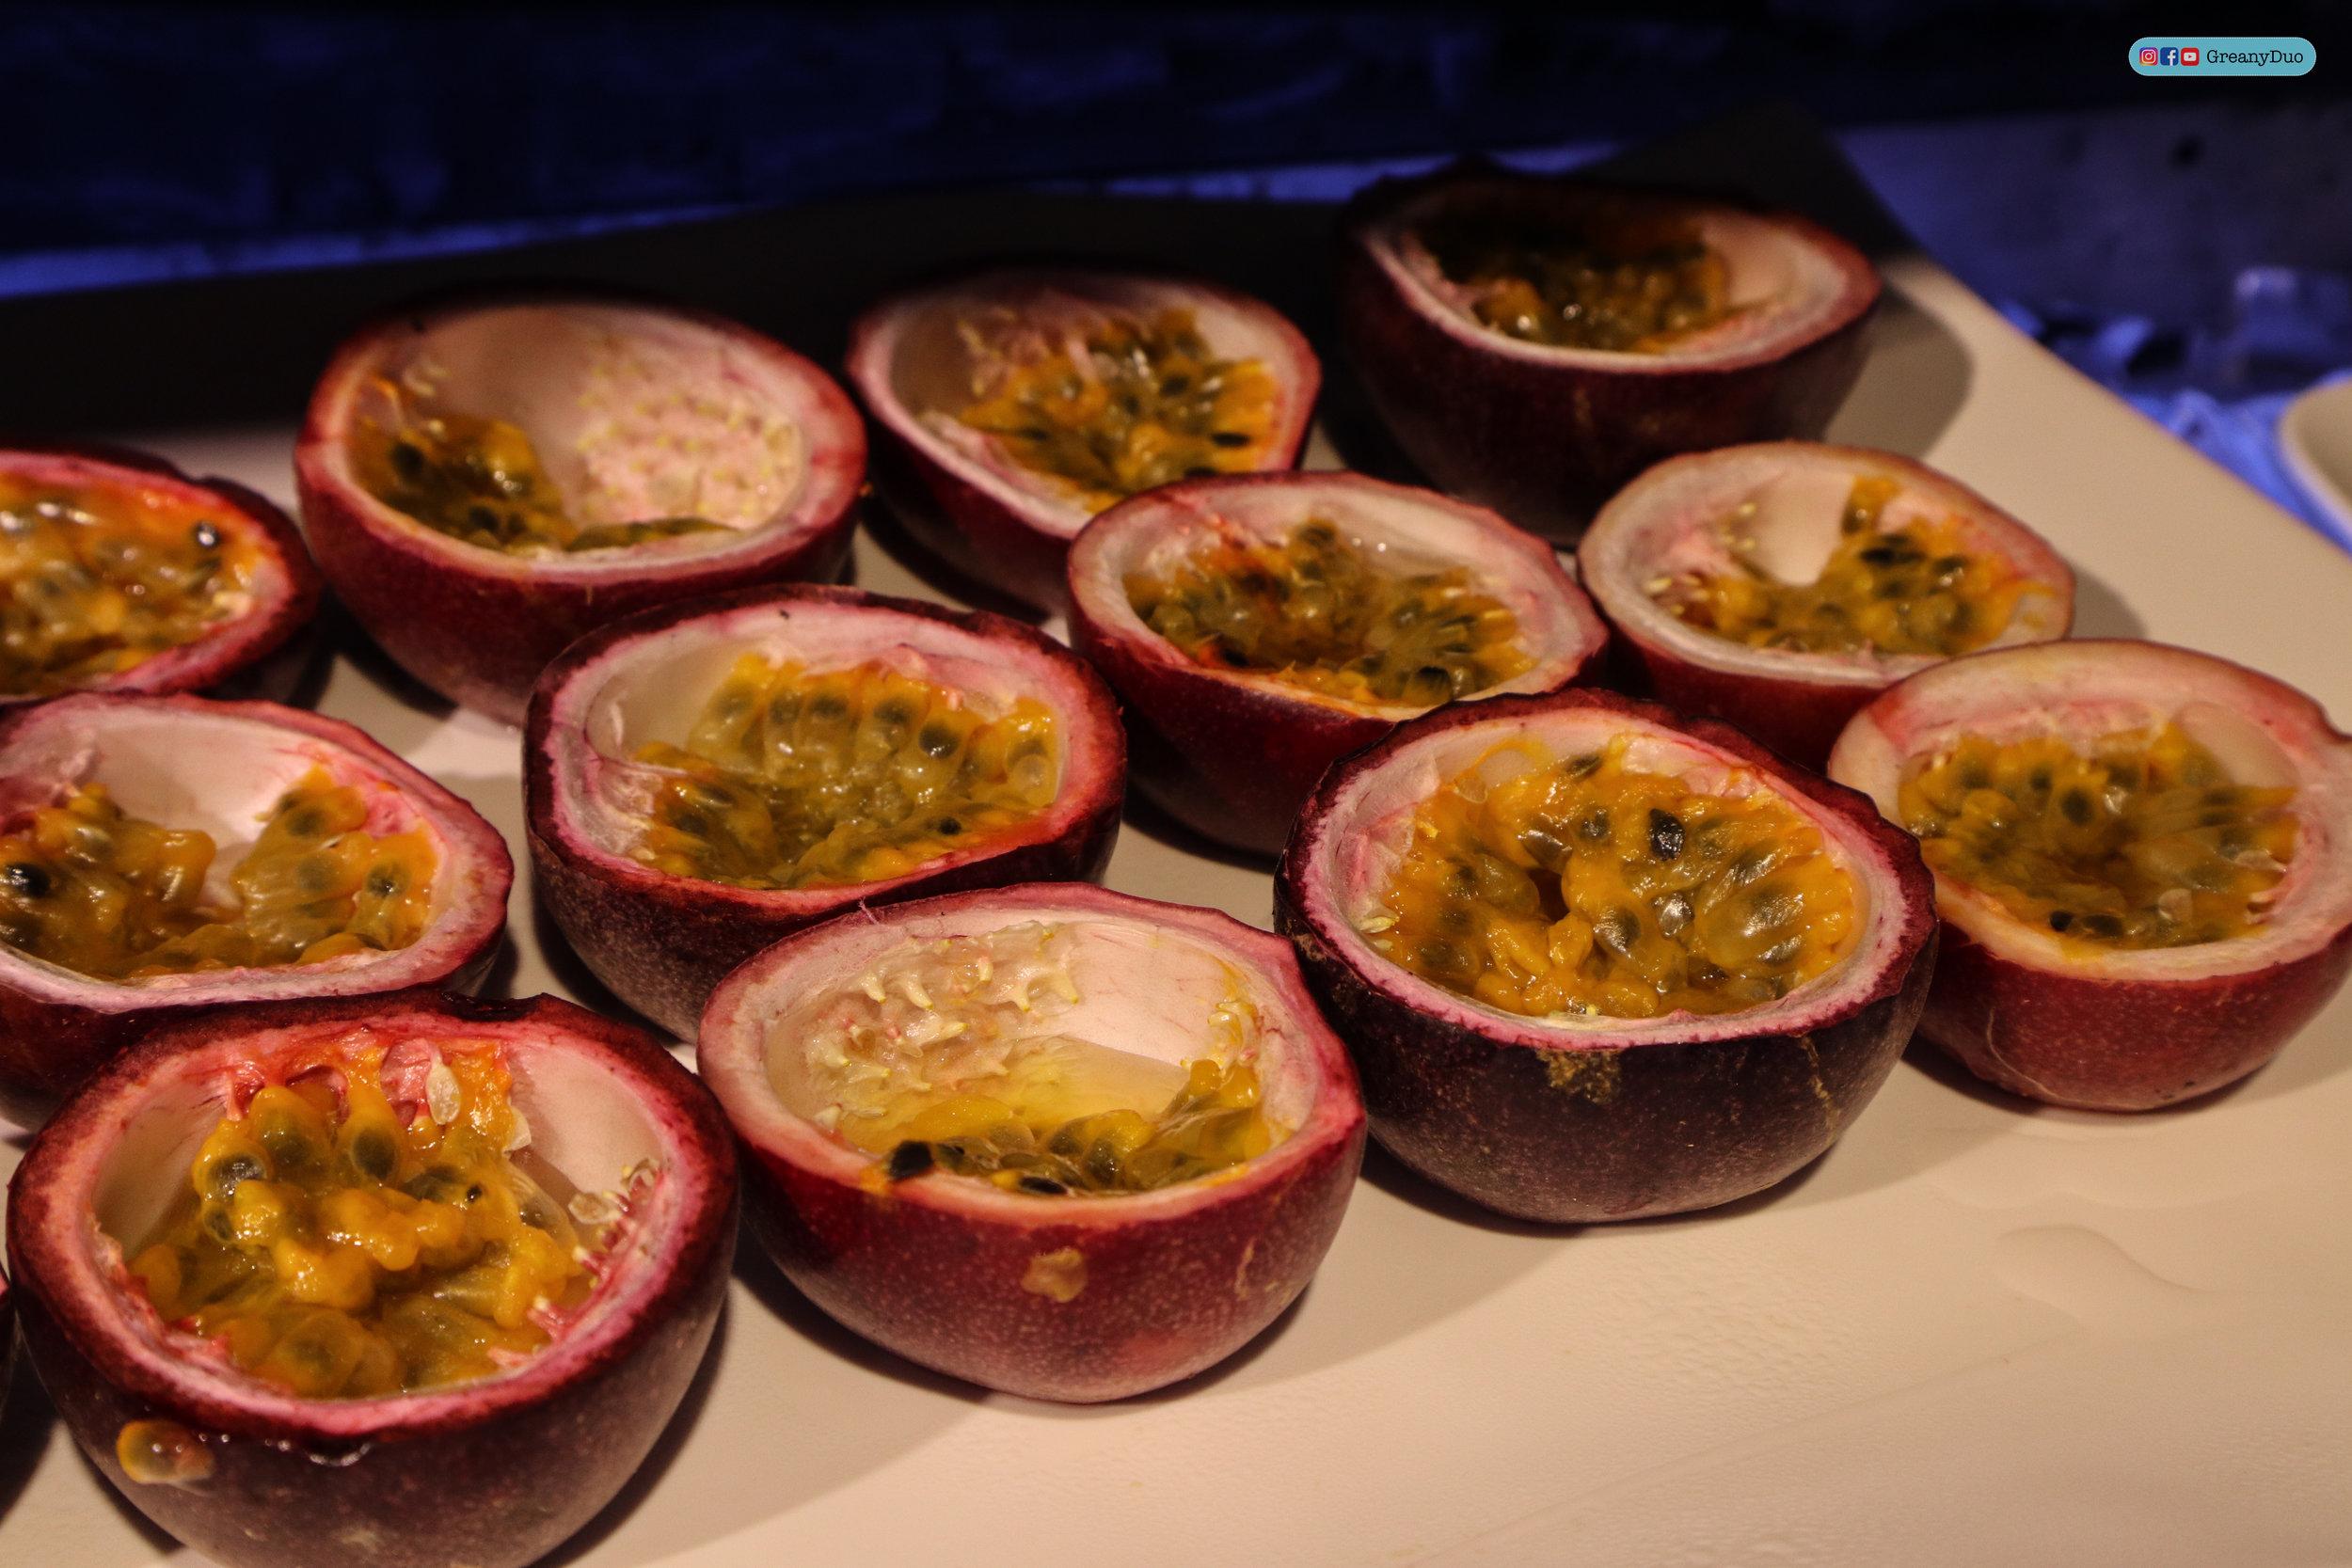 passion fruit at บุฟเฟ่ต์ชาบูไต้หวันที่ Hakkai Shabu Shabu ซีเหมินติง